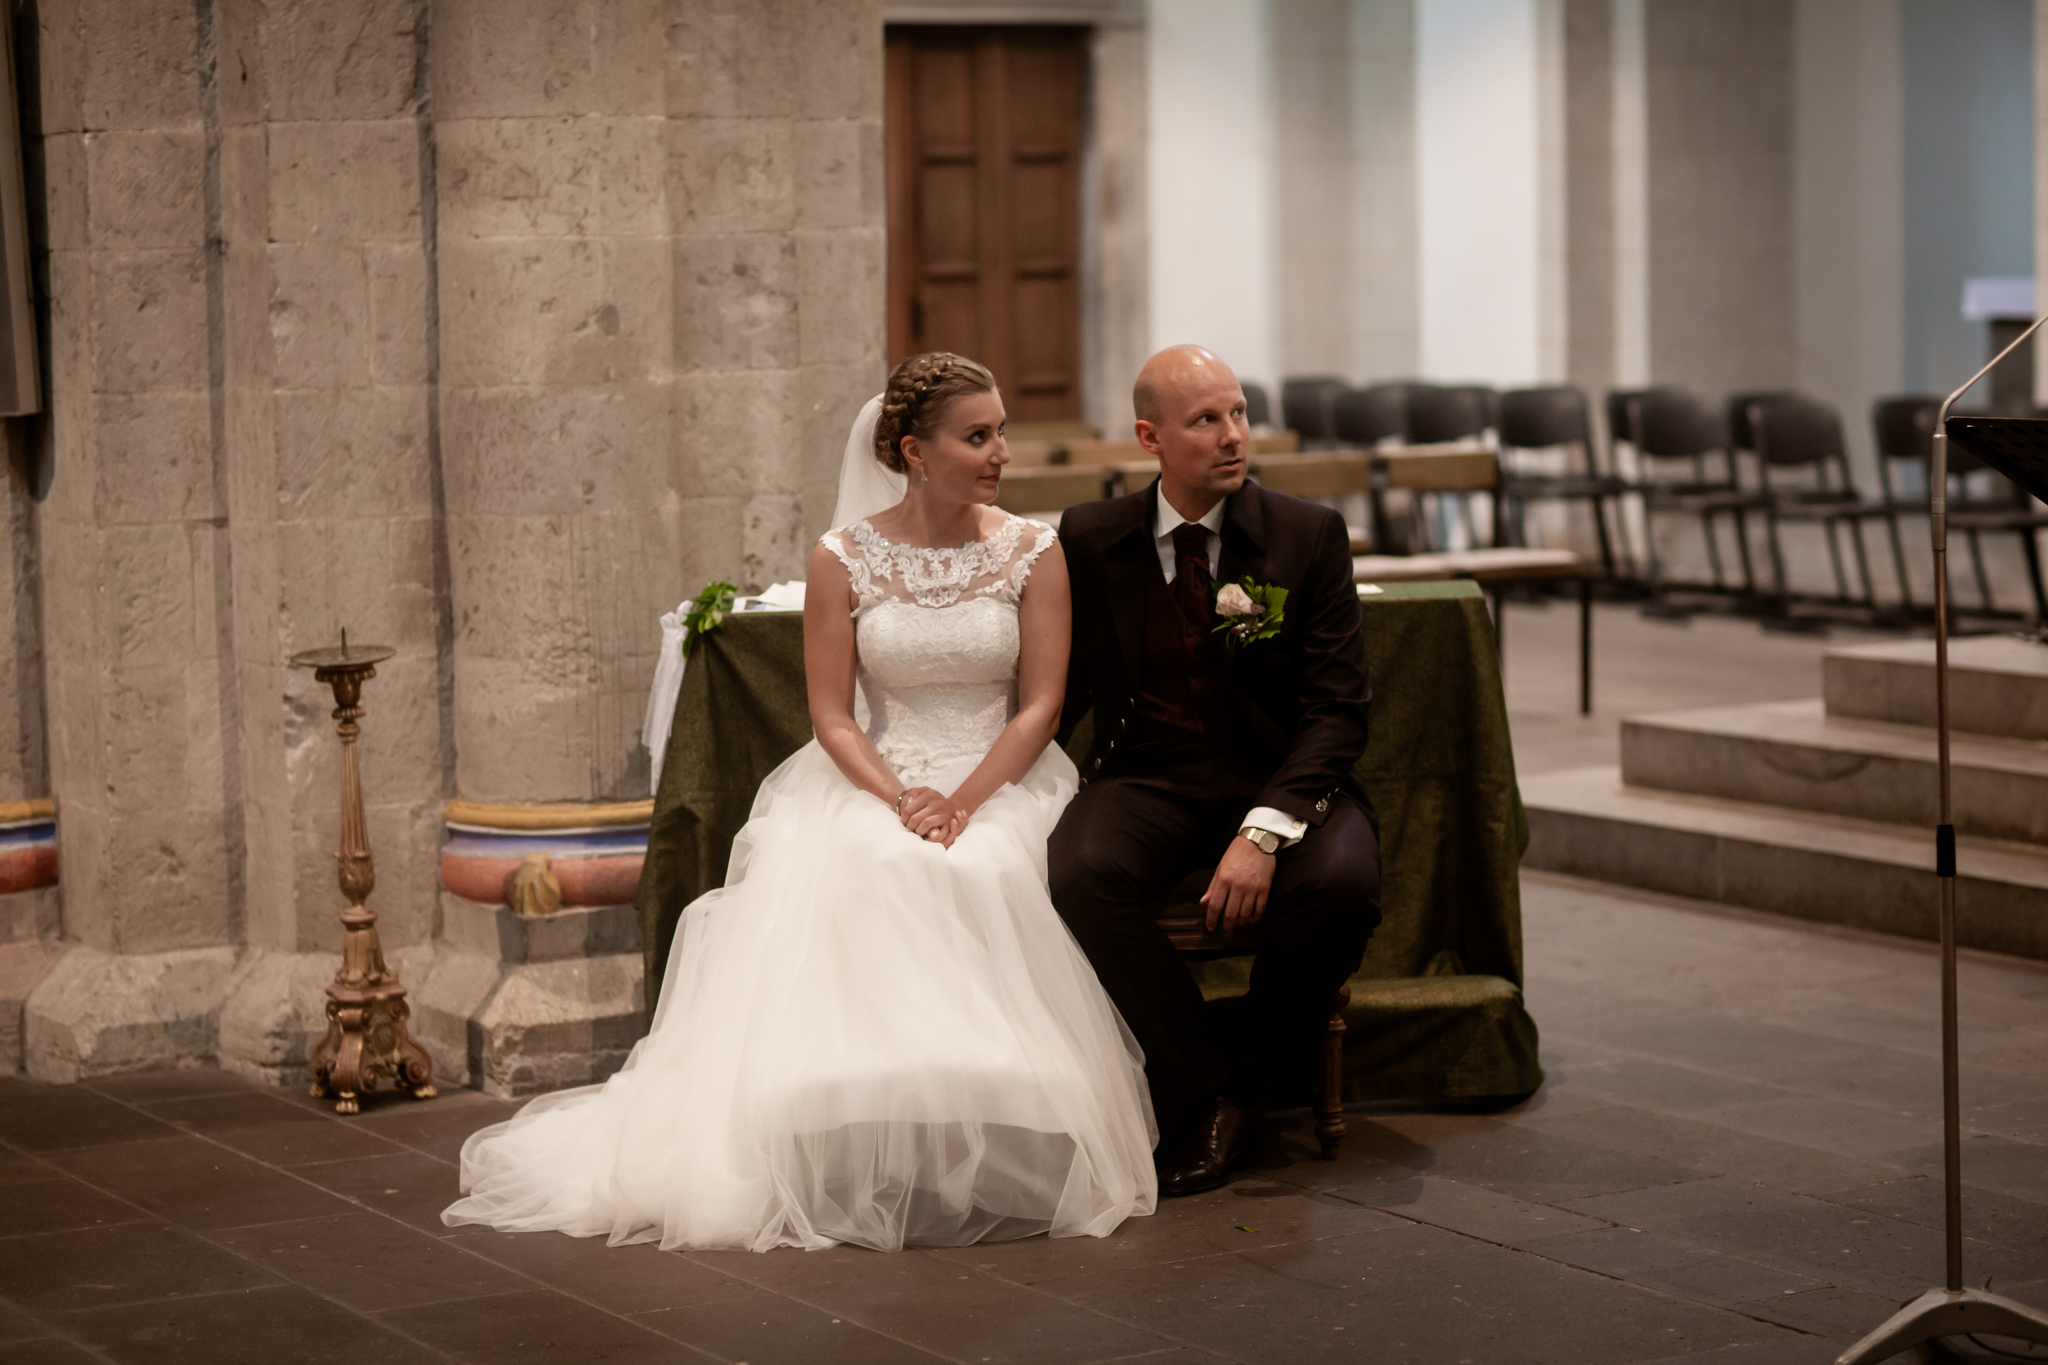 Claudia Krawinkel Fotografie Hochzeitsfotograf Essen Düsseldorf Dormagen Kloster Knechtsteden Hochzeitsreportage Hochzeit Knechtsteden62